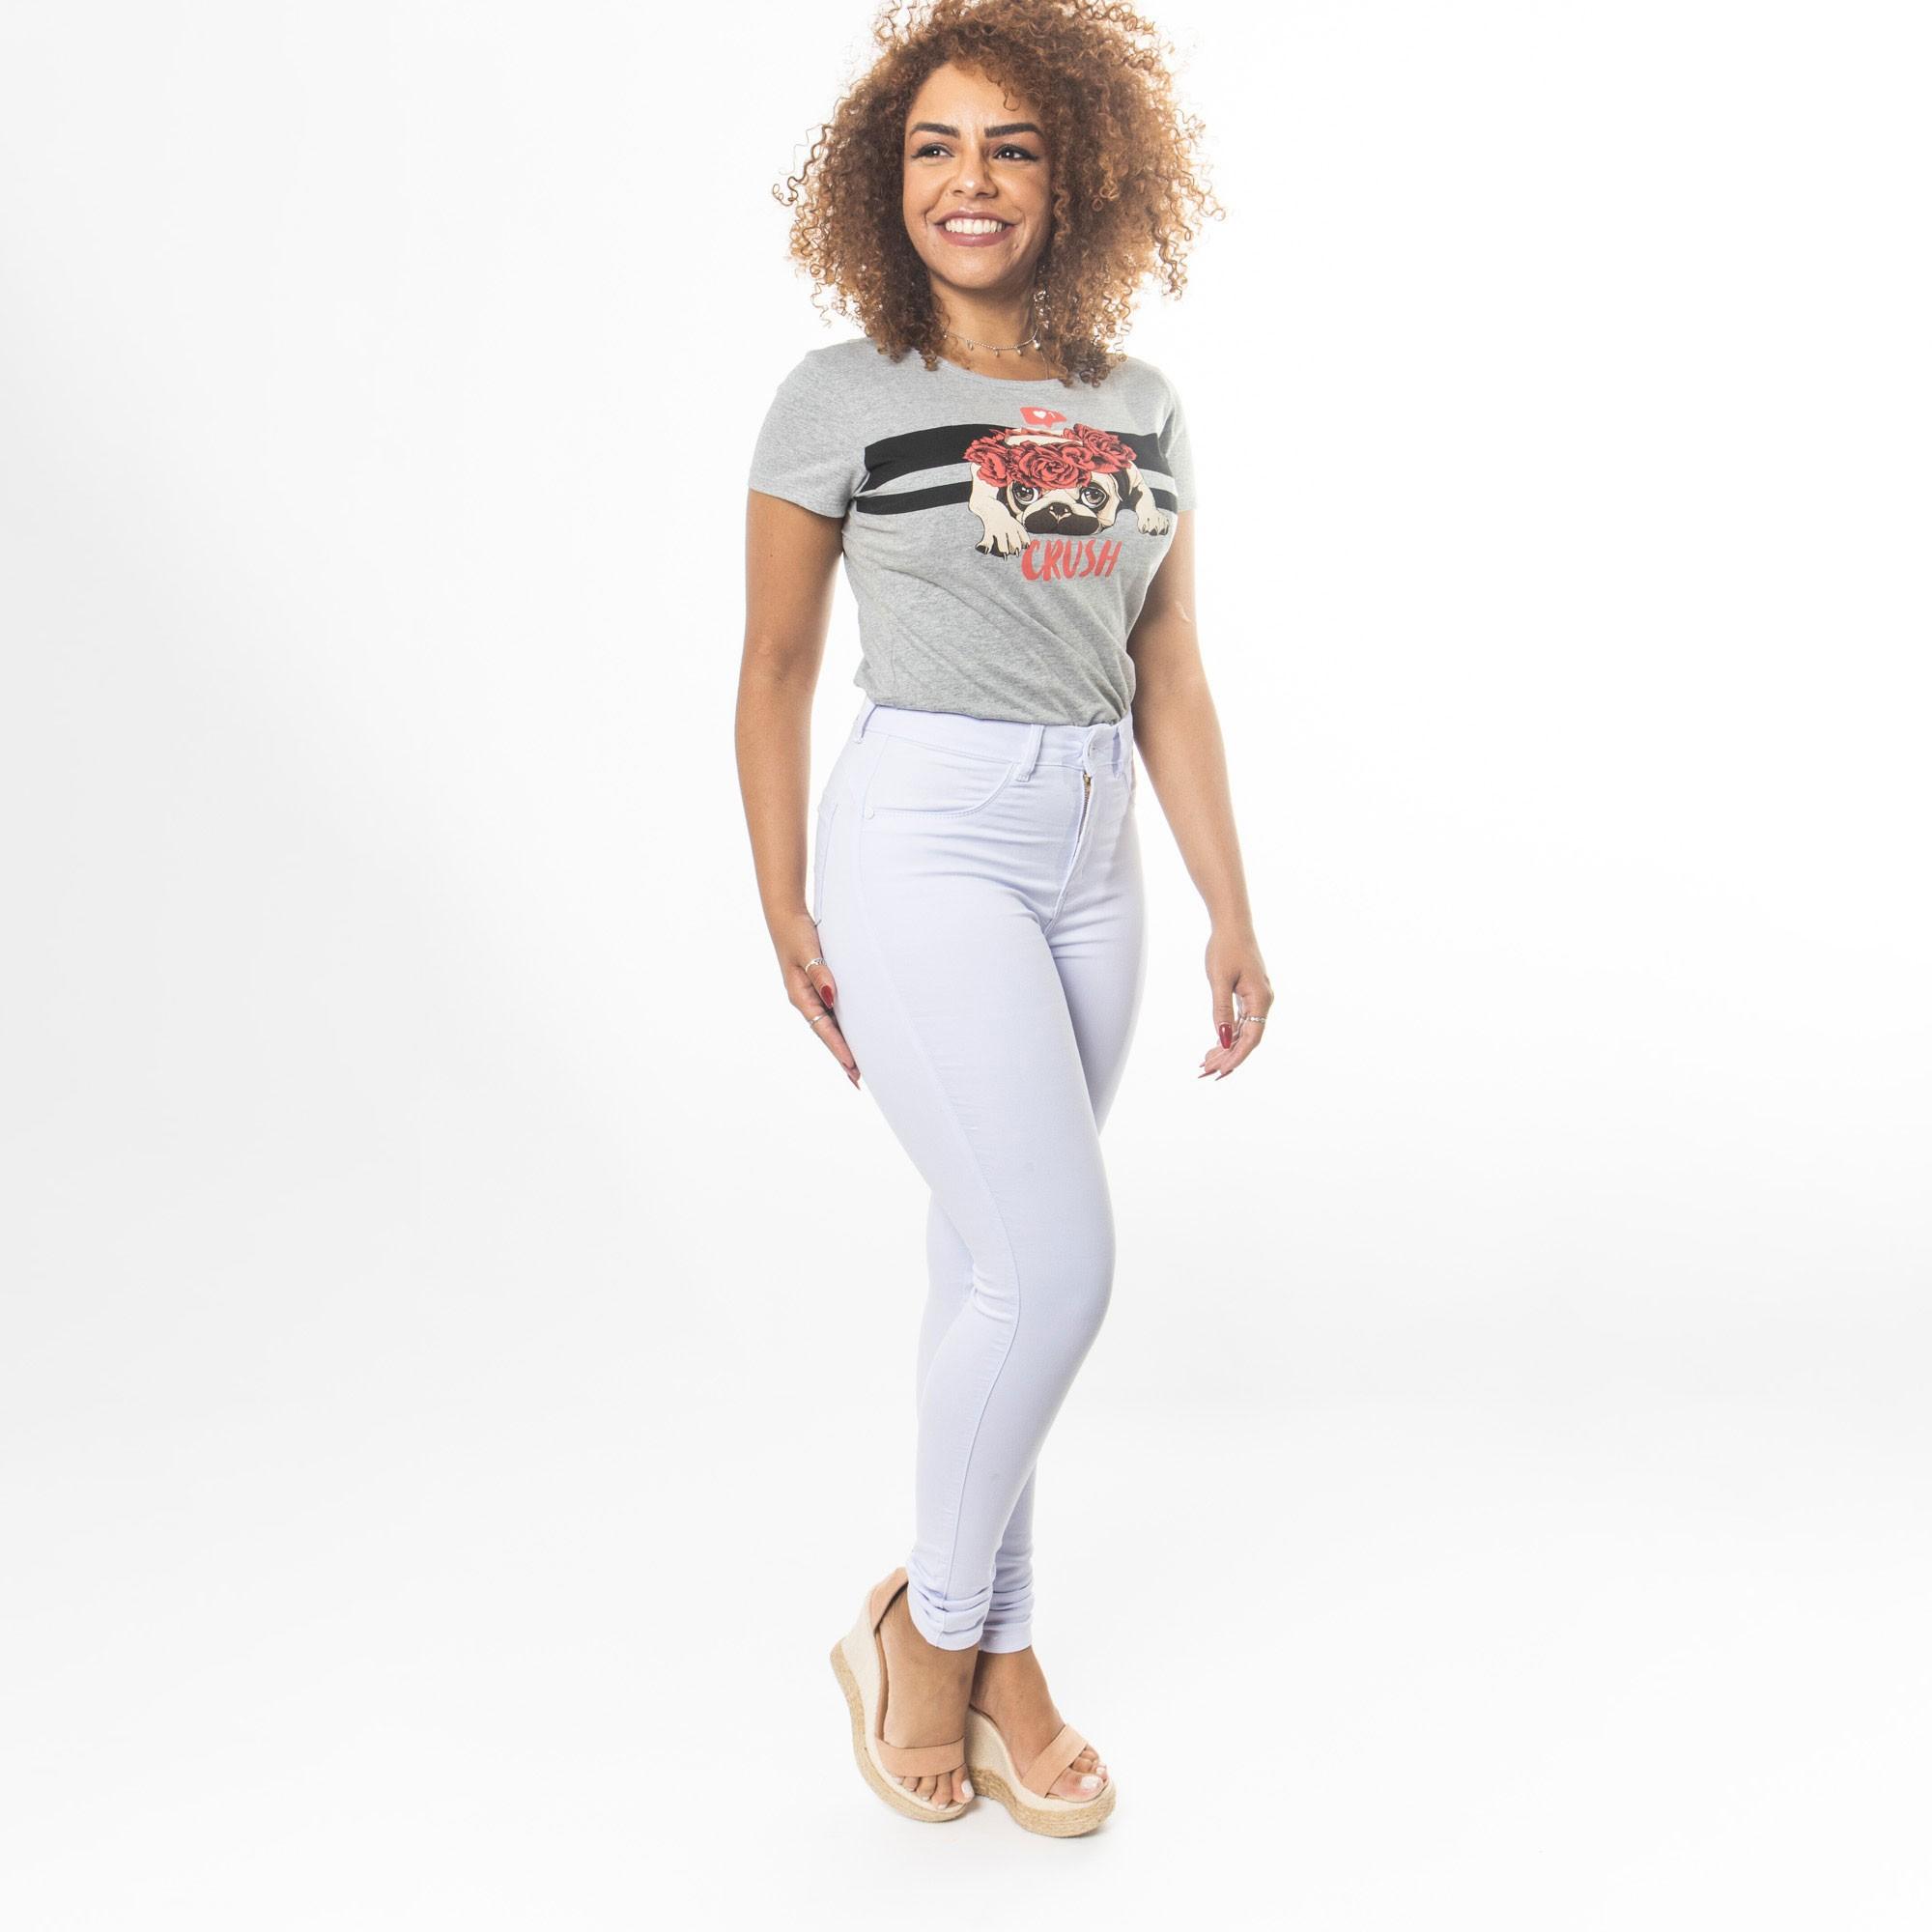 Calça Branca Jeans Cintura Alta -Potêncial Jeans